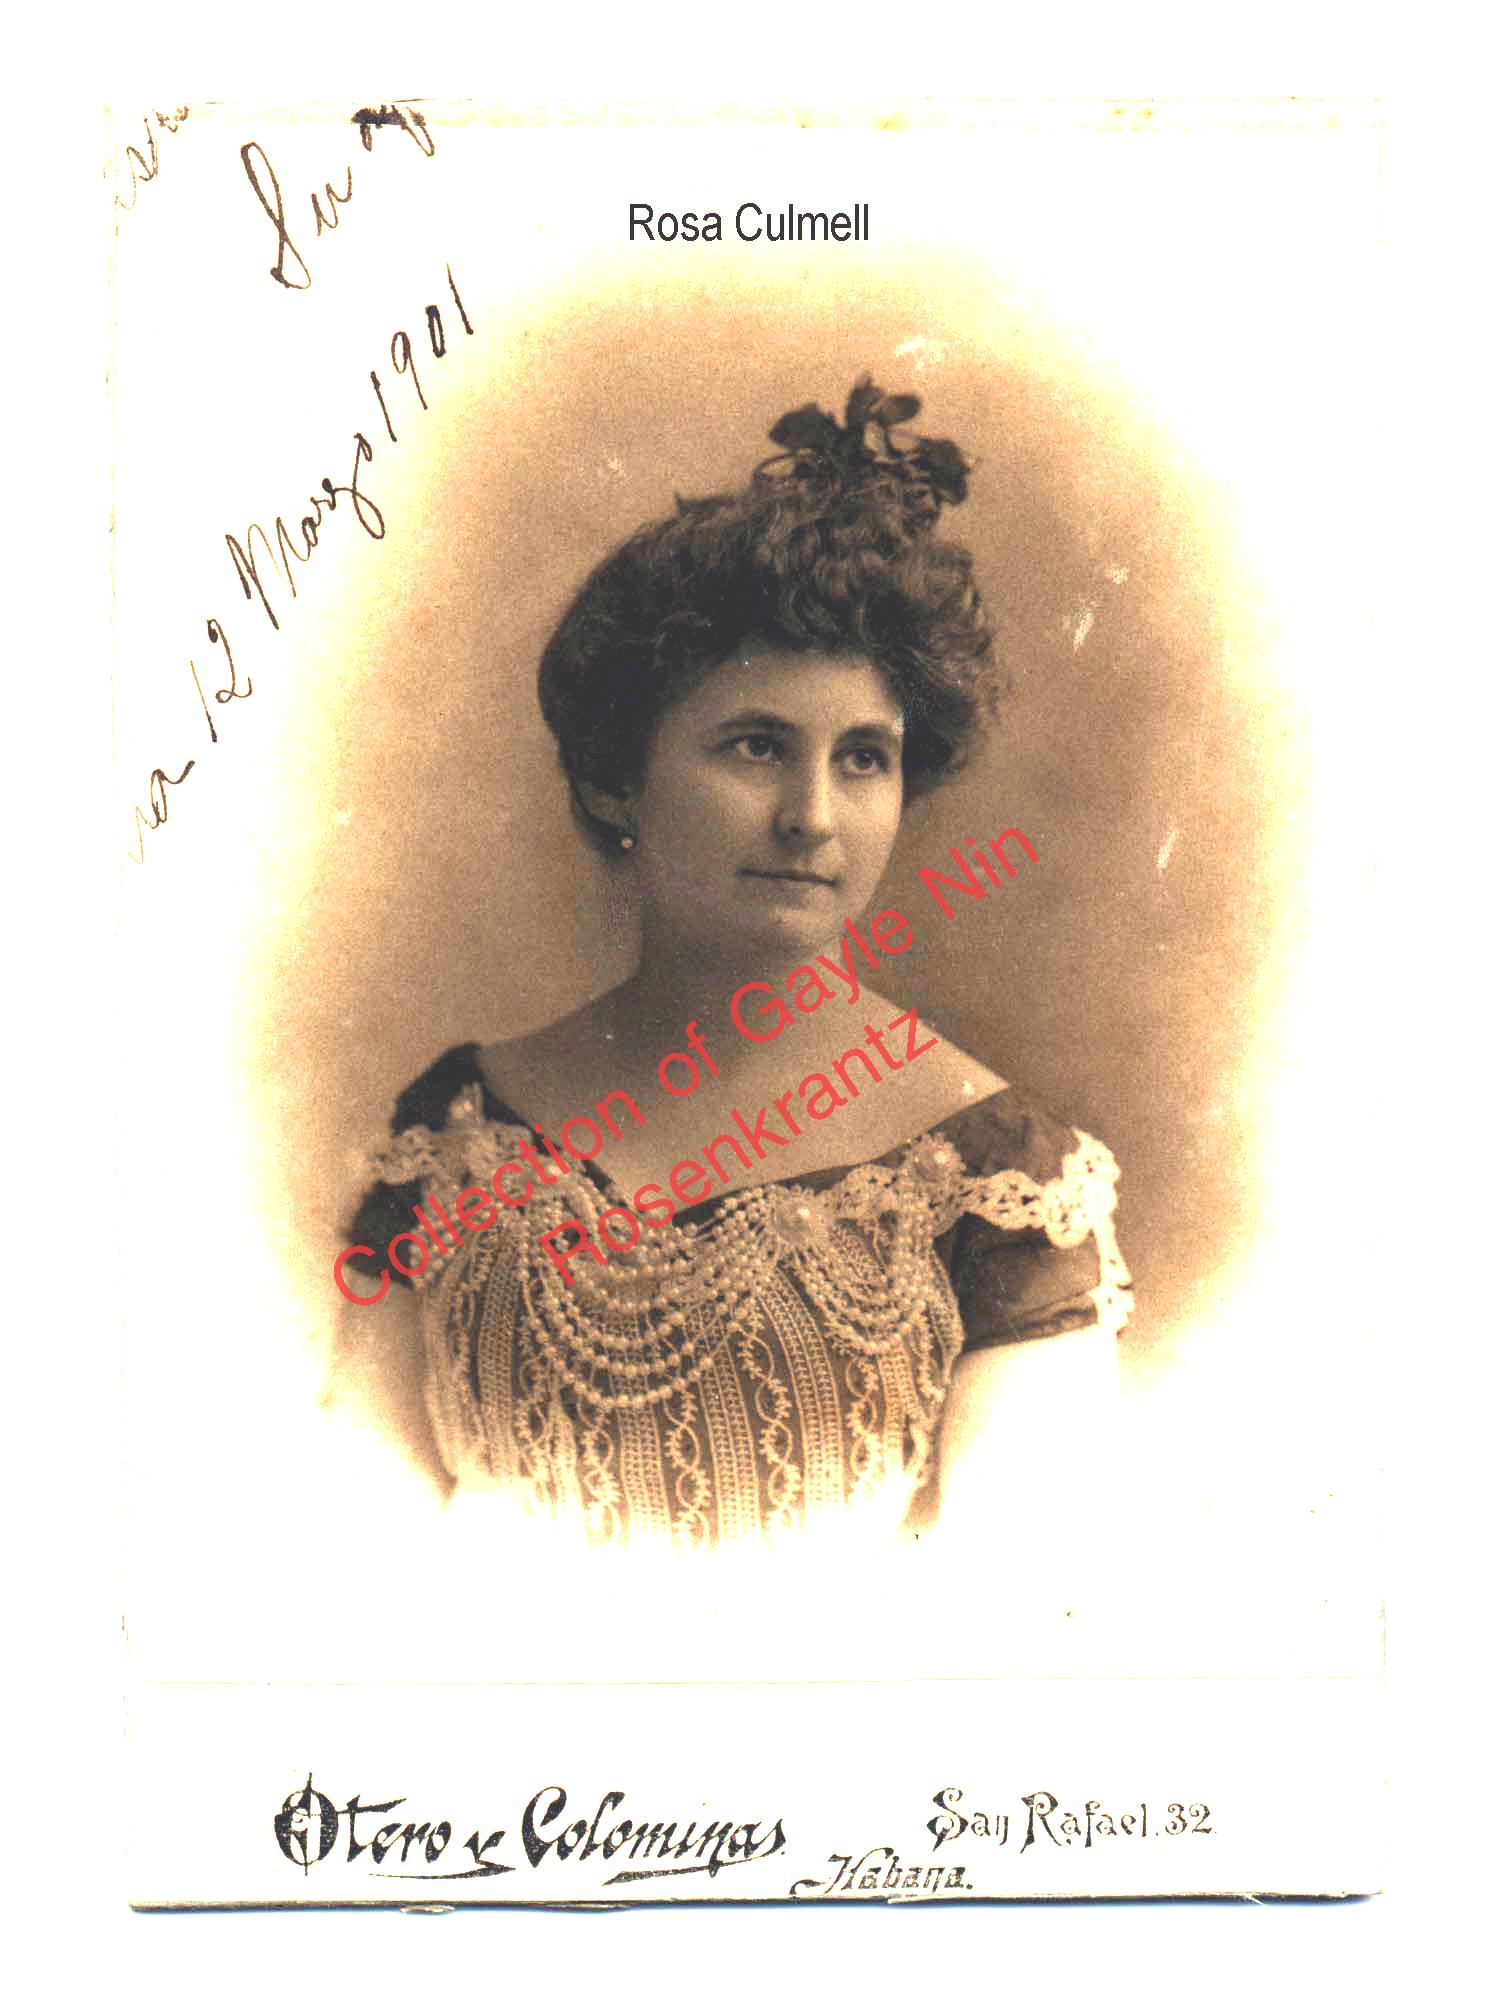 Rosa Culmell, 1901